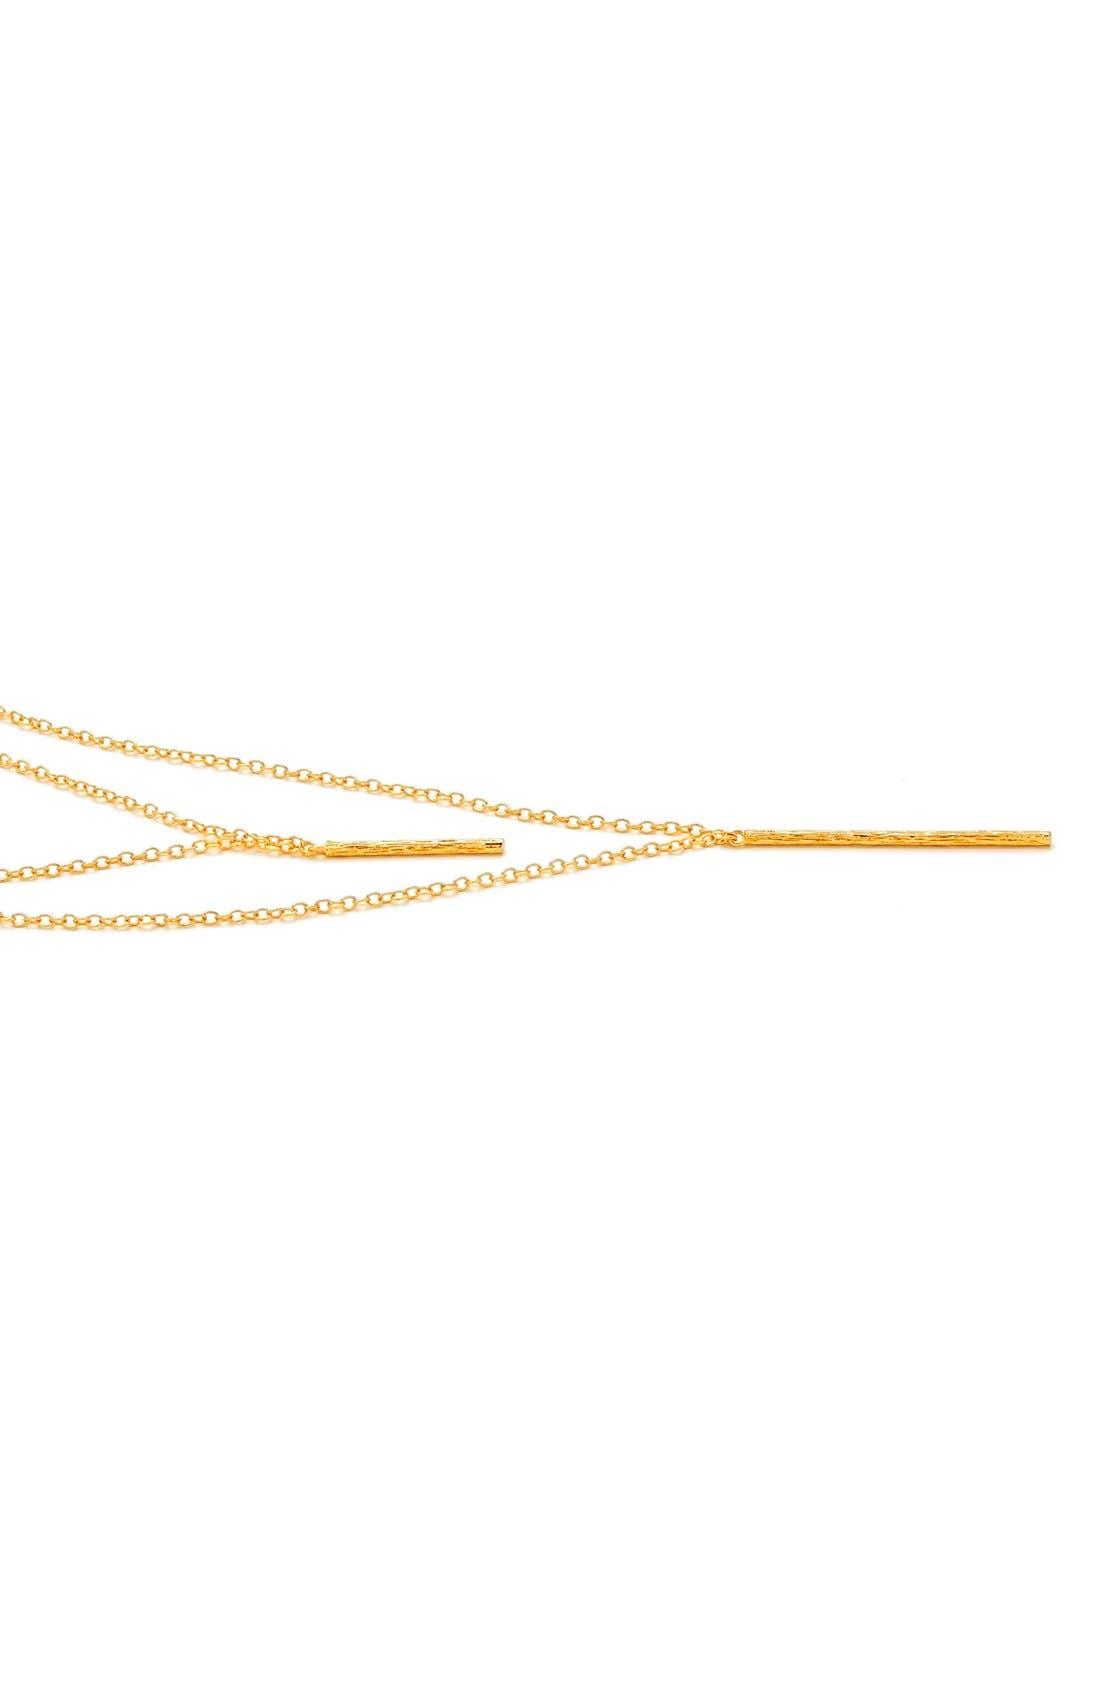 Alternate Image 3  - gorjana 'Kiernan' Layered Pendant Necklace